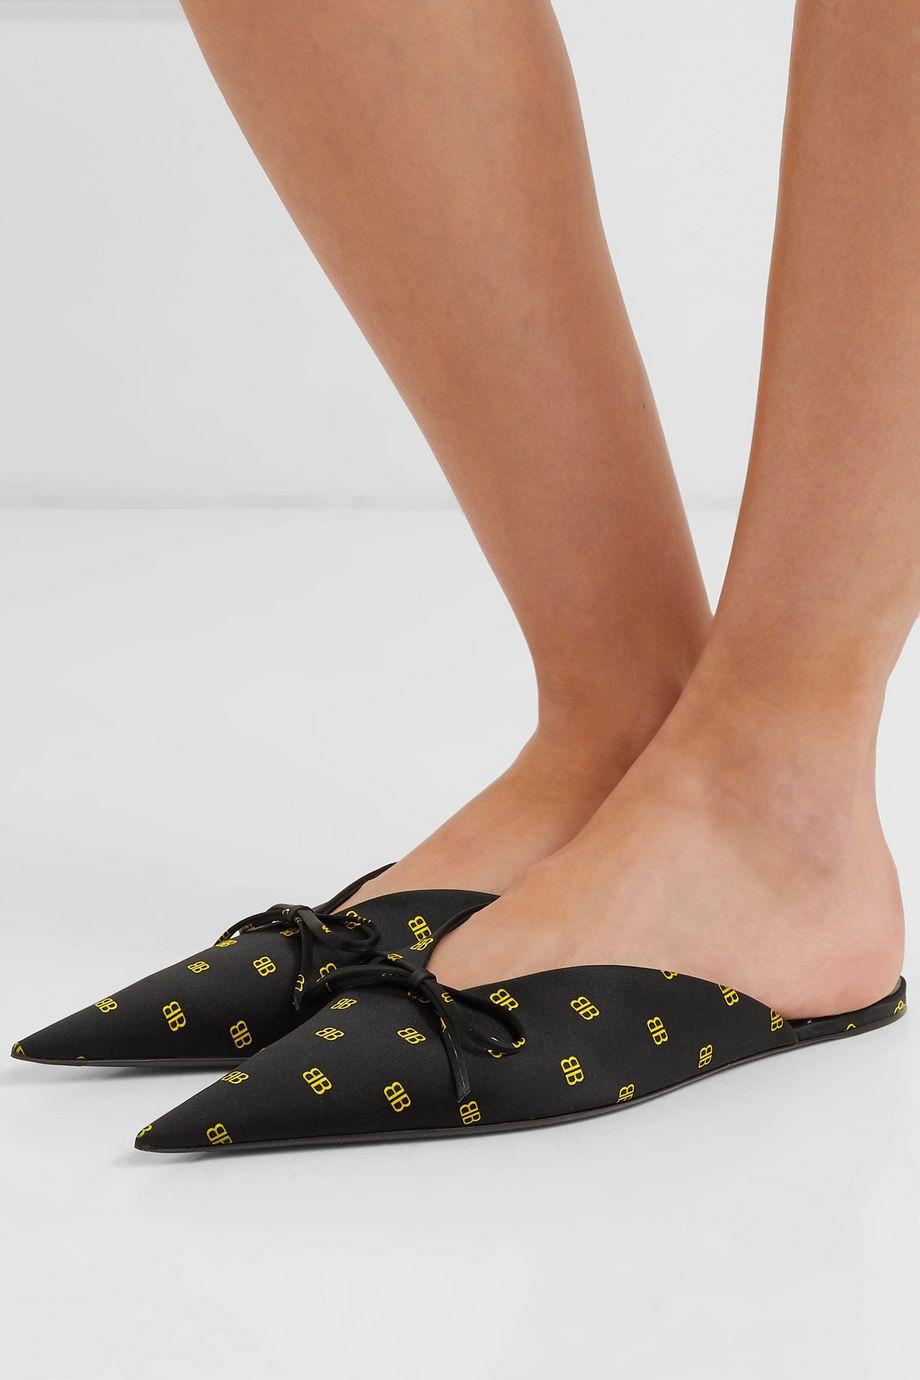 Balenciaga Knife logo-print satin slippers